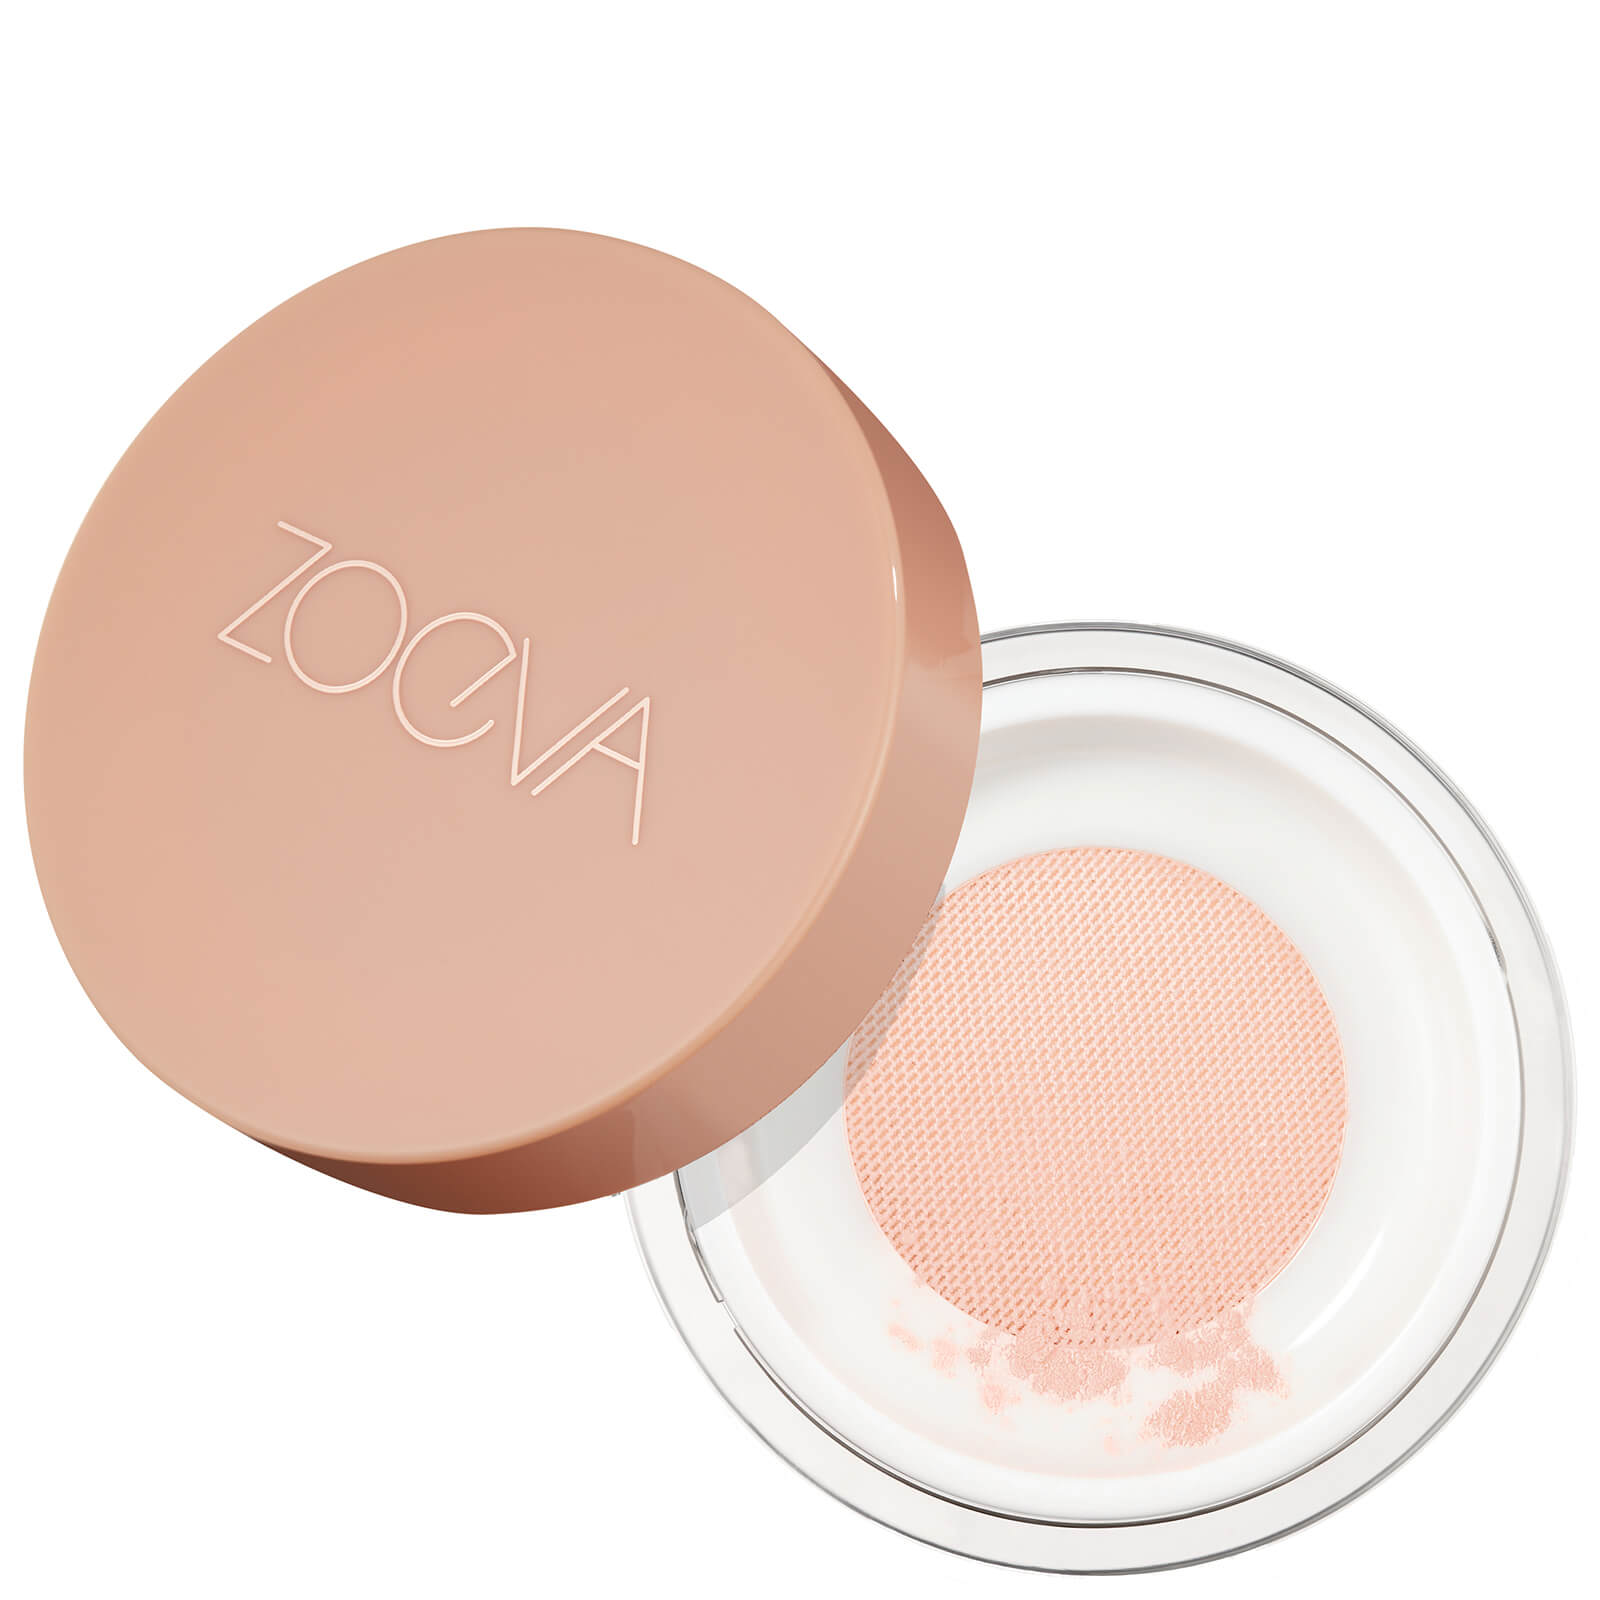 Купить ZOEVA Authentik Skin Finishing Powder 14g (Various Shades) - Dazzling